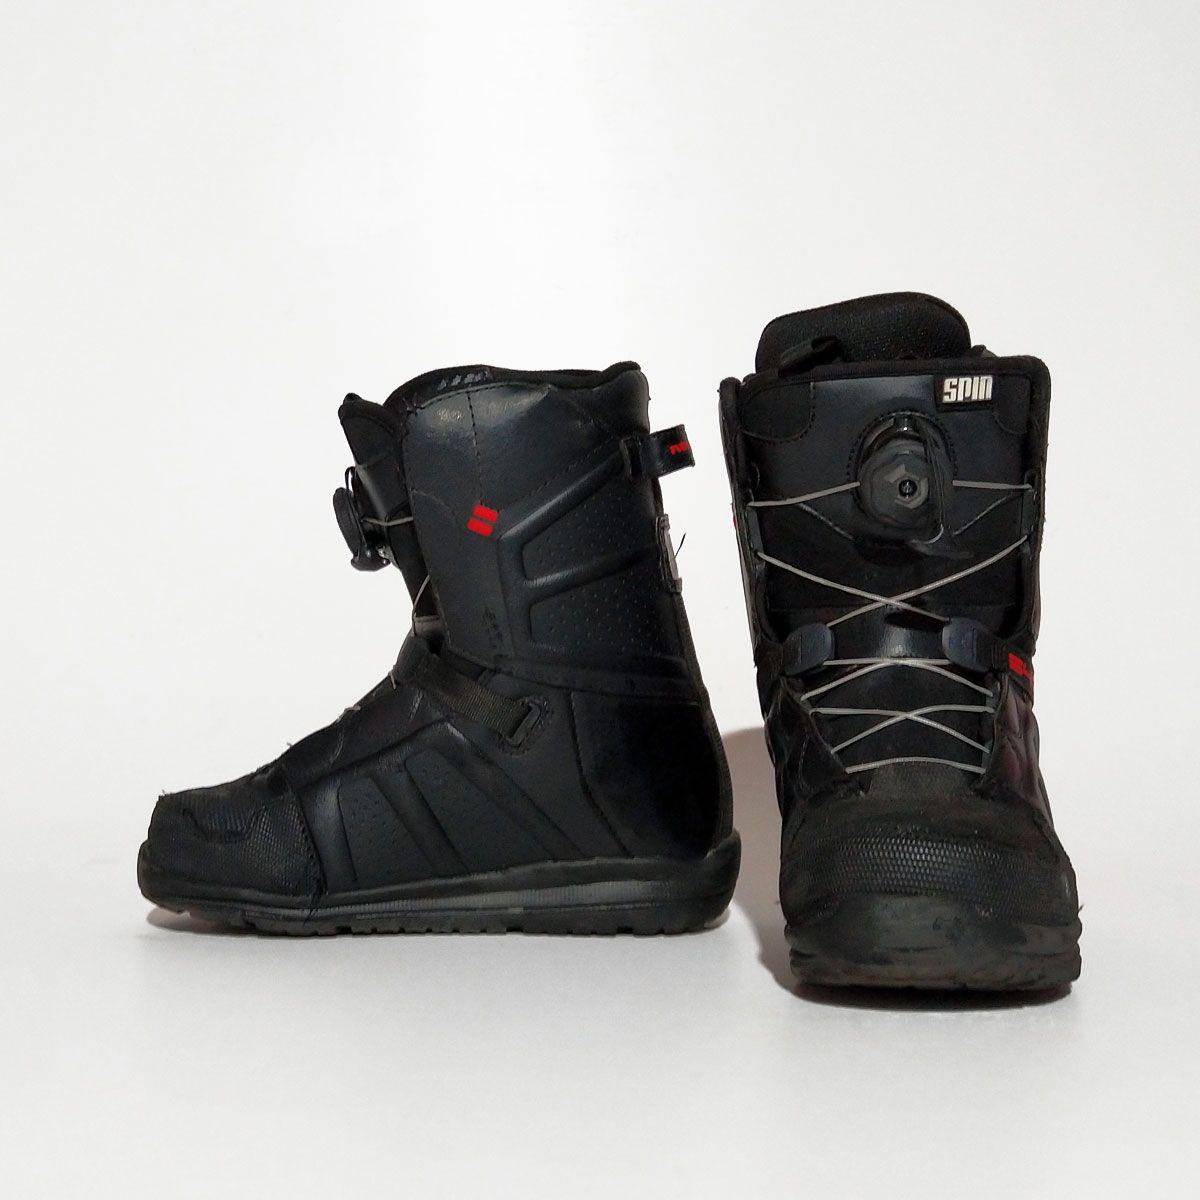 boots-northwave-s40-2